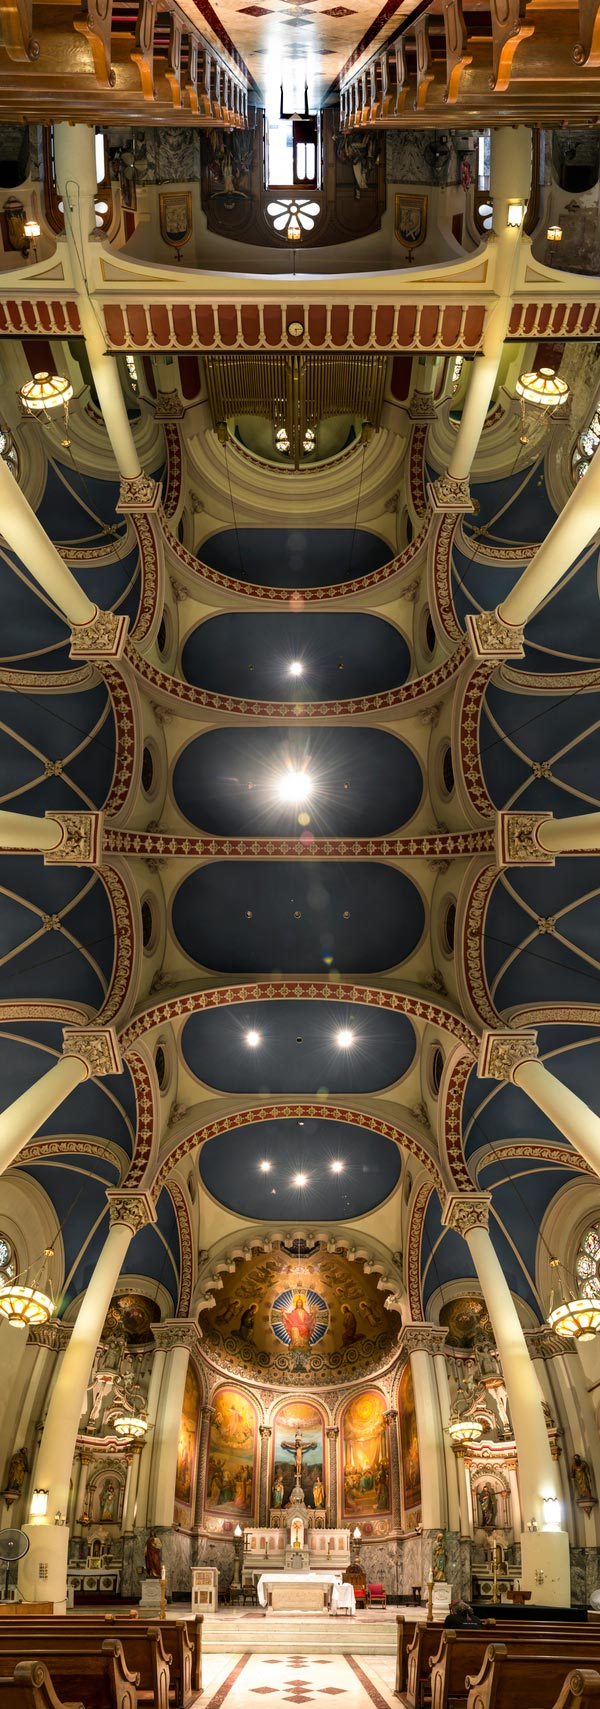 vertical panoramas of church ceilings 5 Amazing Vertical Panoramas of Church Ceilings